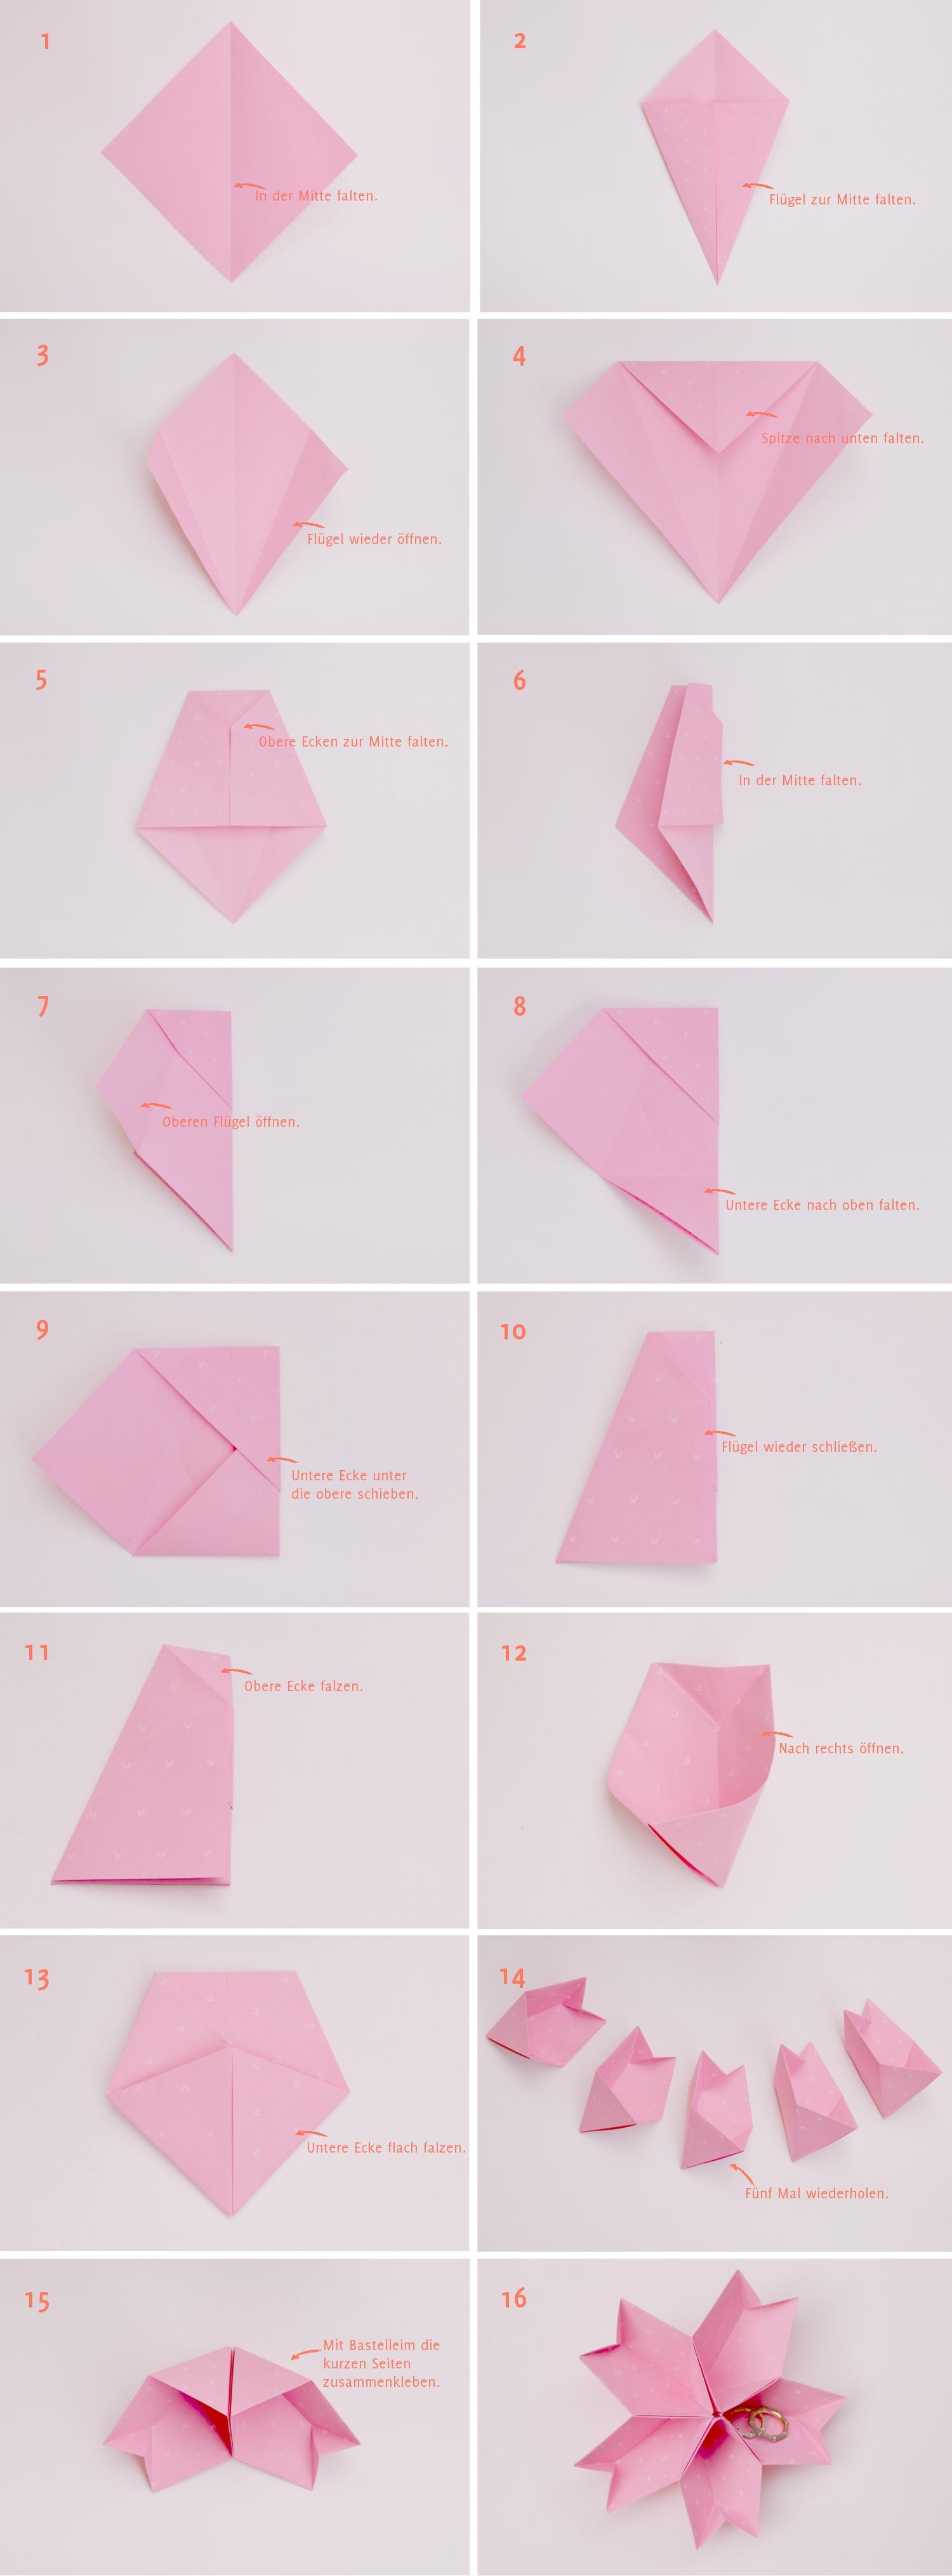 Anleitung: Origami-Kirschblüte als Ringtäger | Verrueckt nach Hochzeit